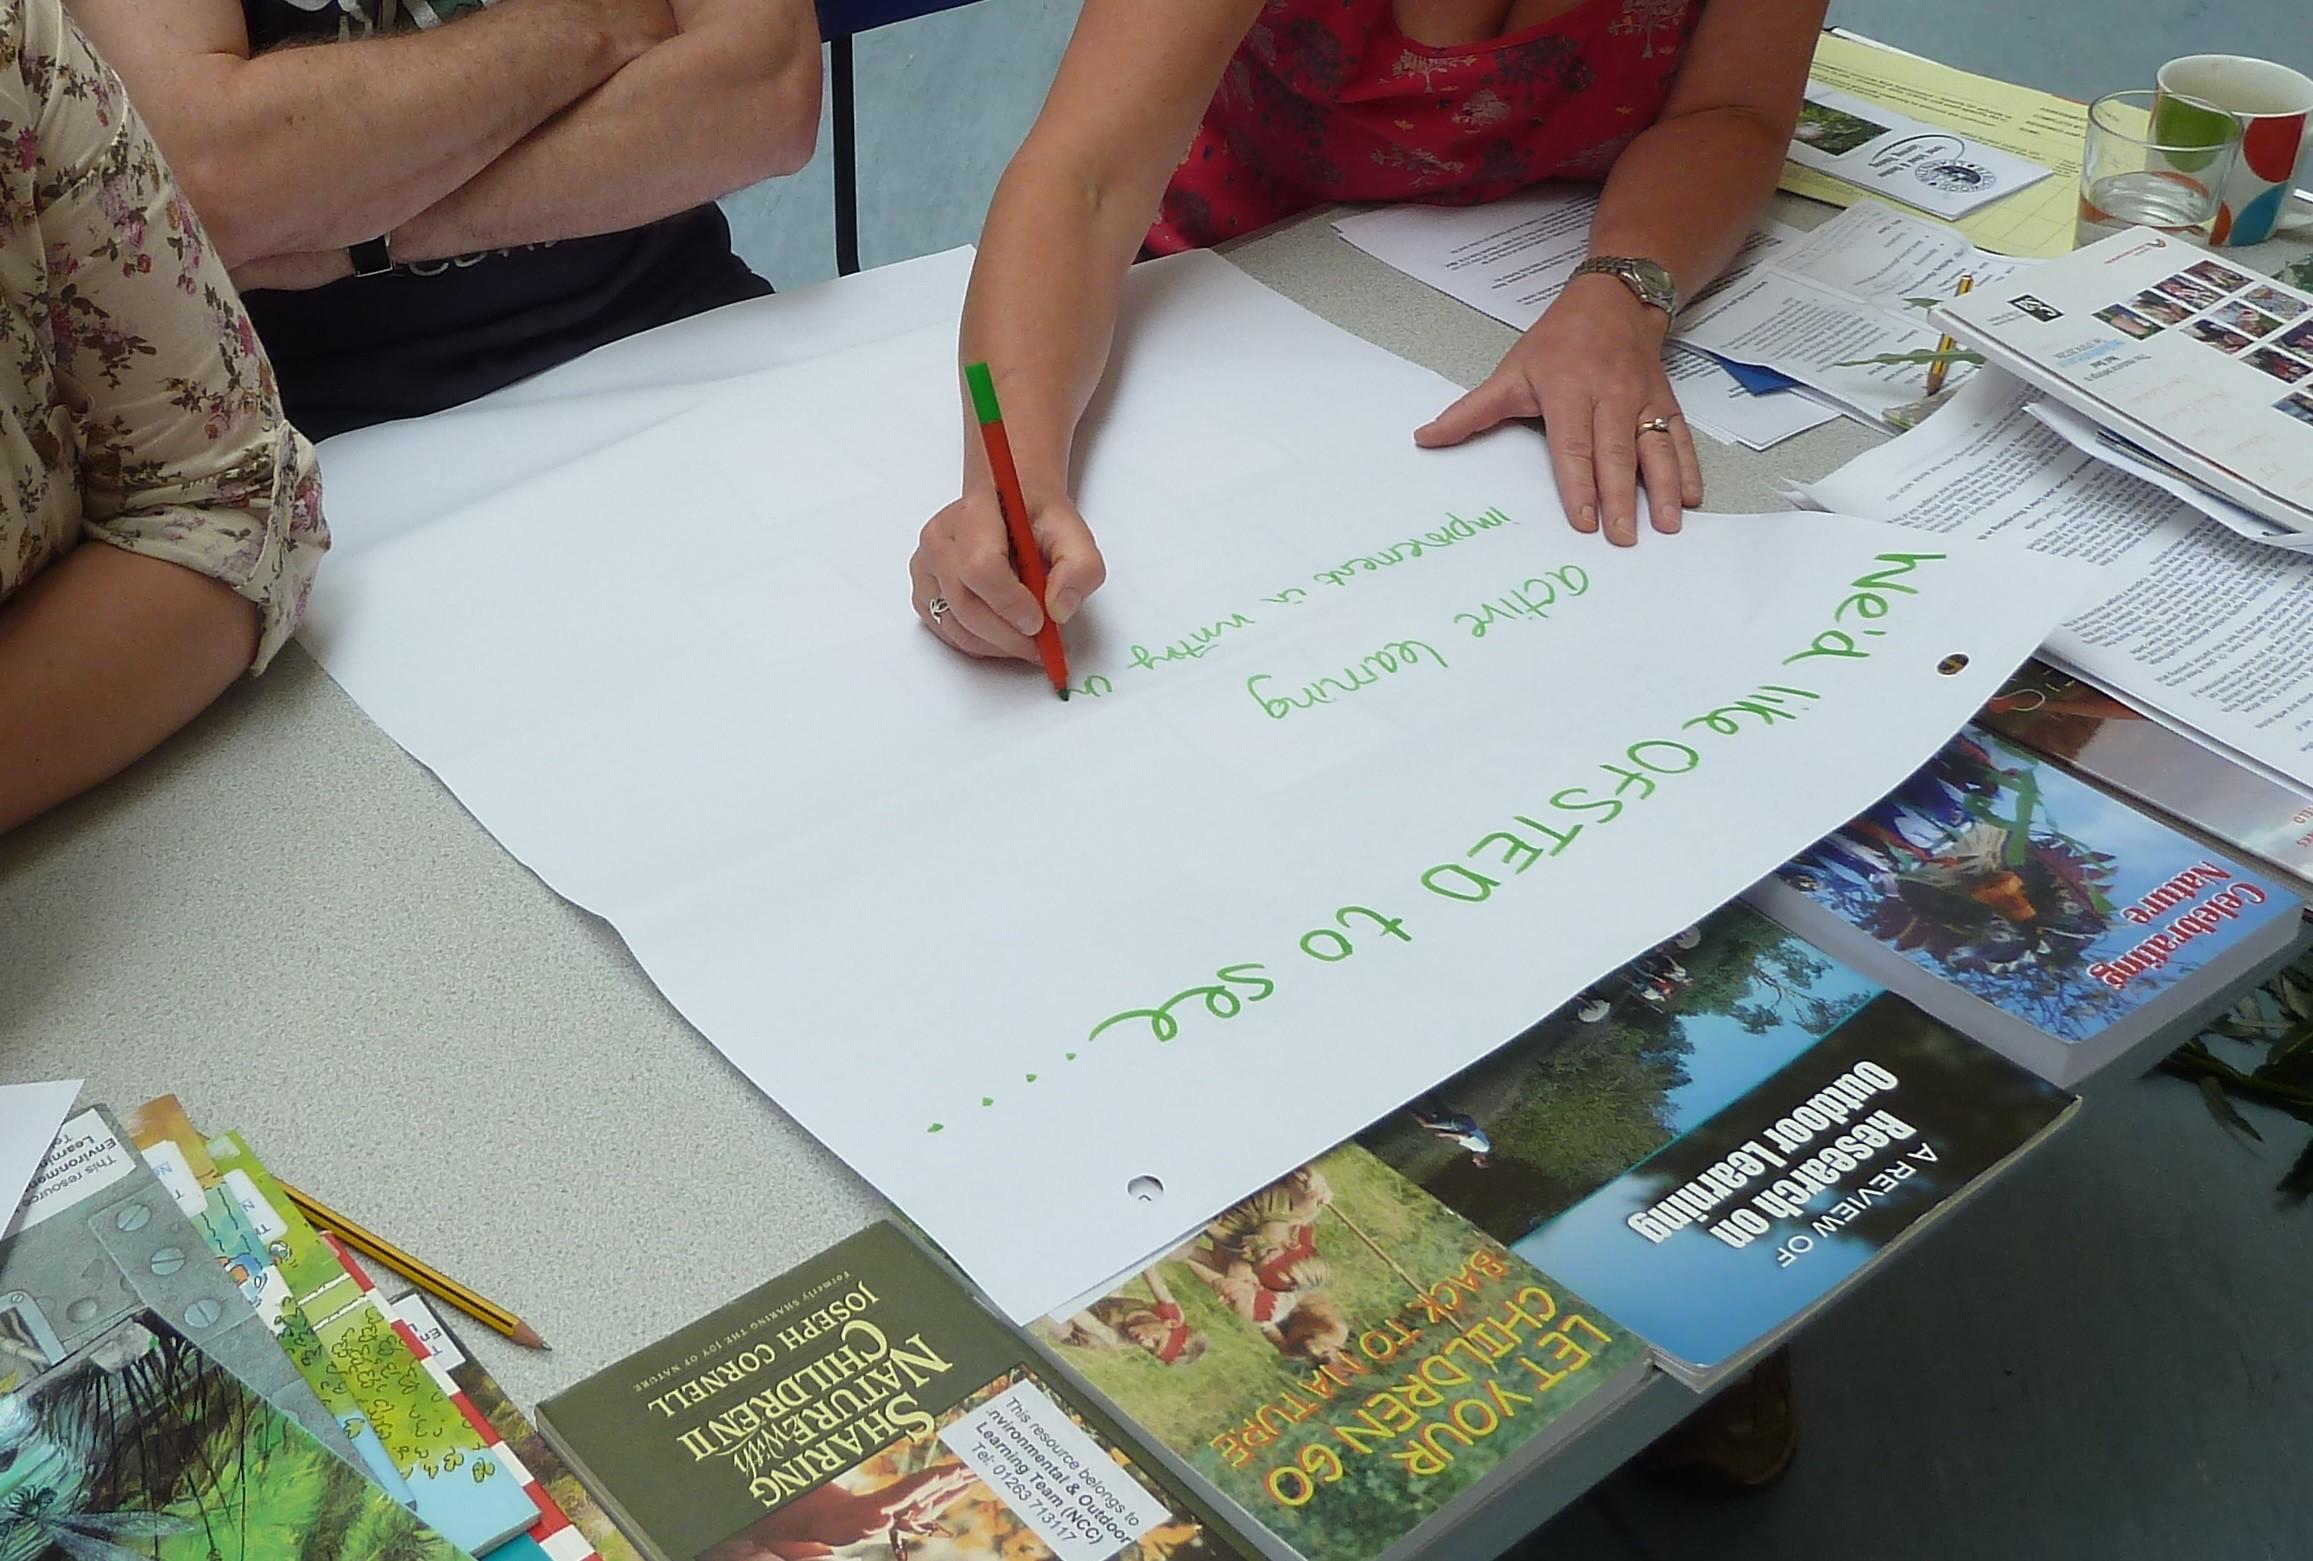 envisioning sustainable schools (eco-schools)